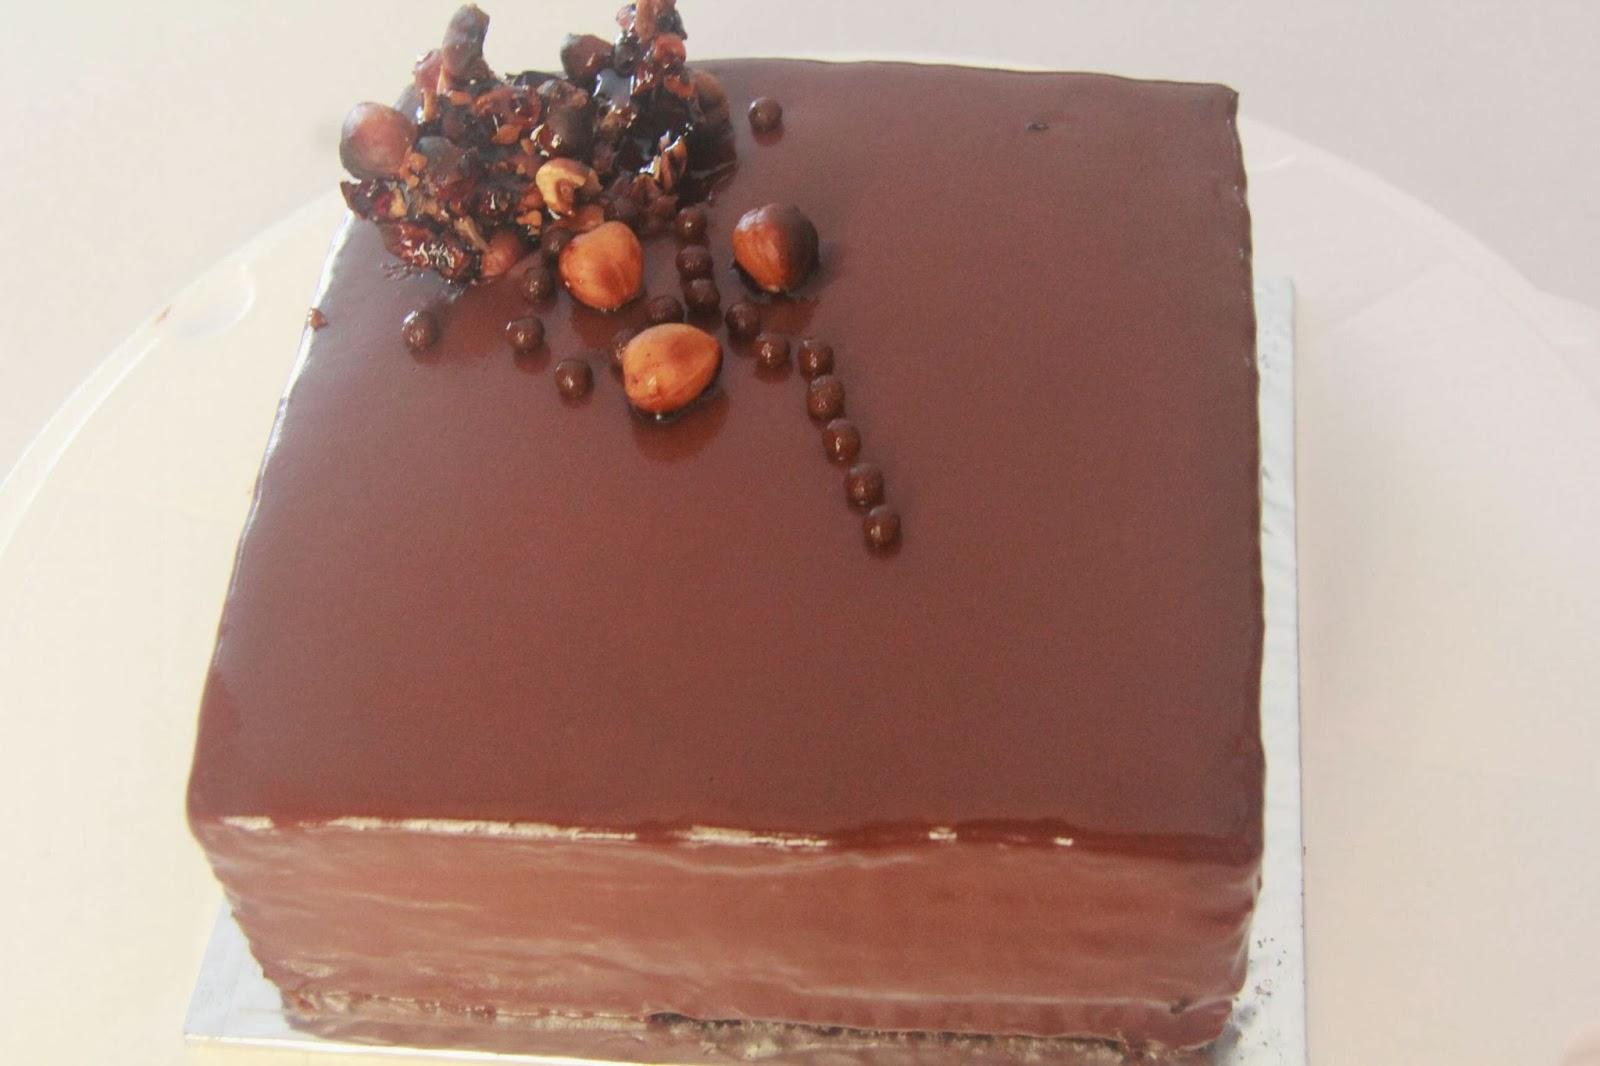 Royal Chocolate Cake Images : Simple Indulgence: Royal Chocolate Praline